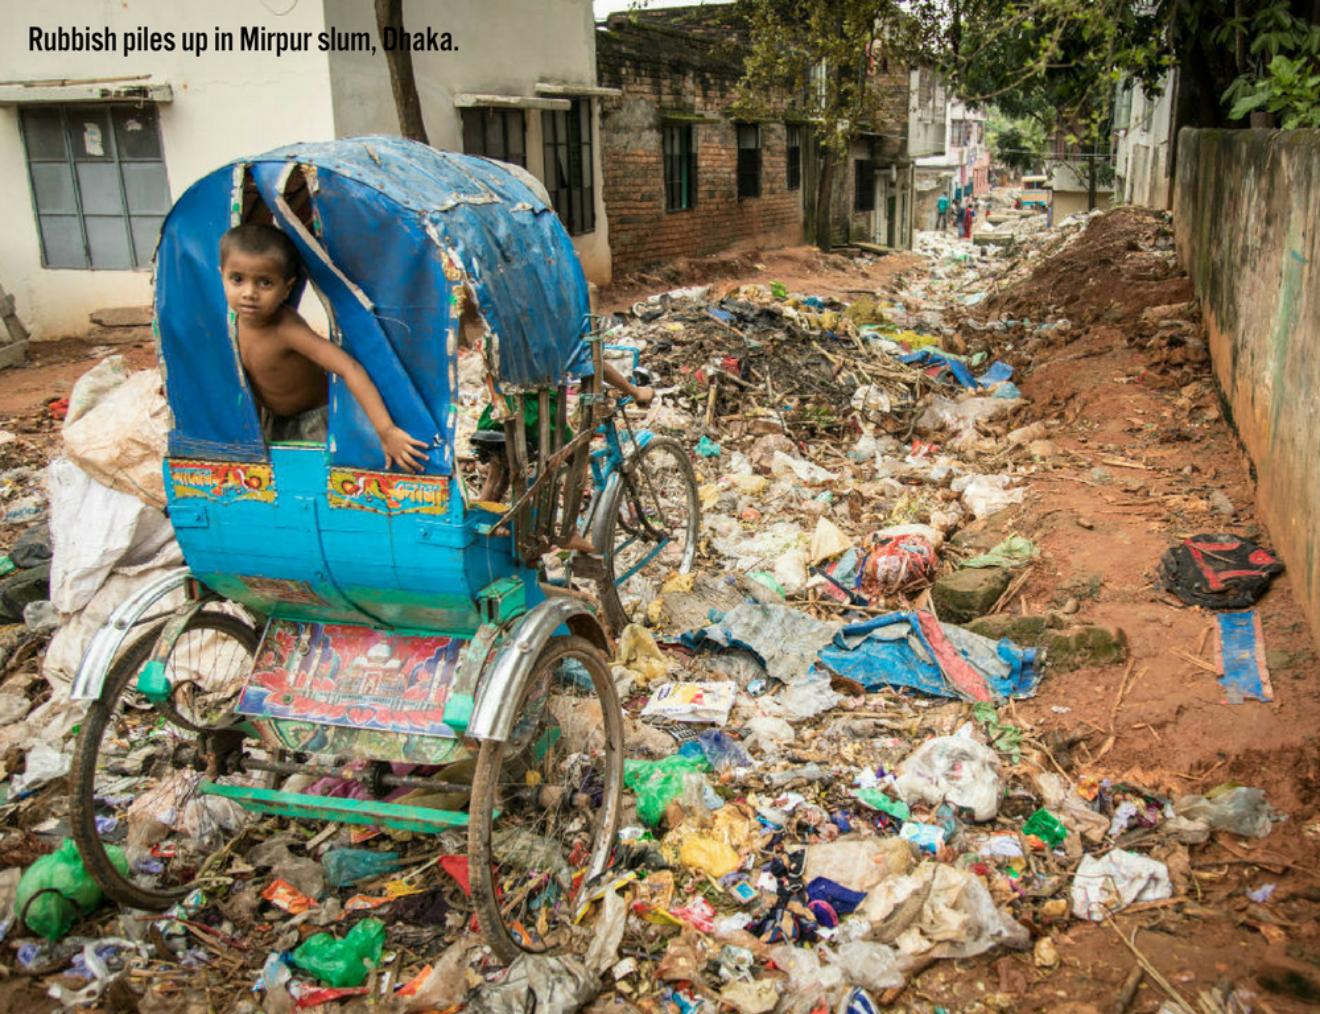 Waste Piles Up In Mirpur Slum Dhaka